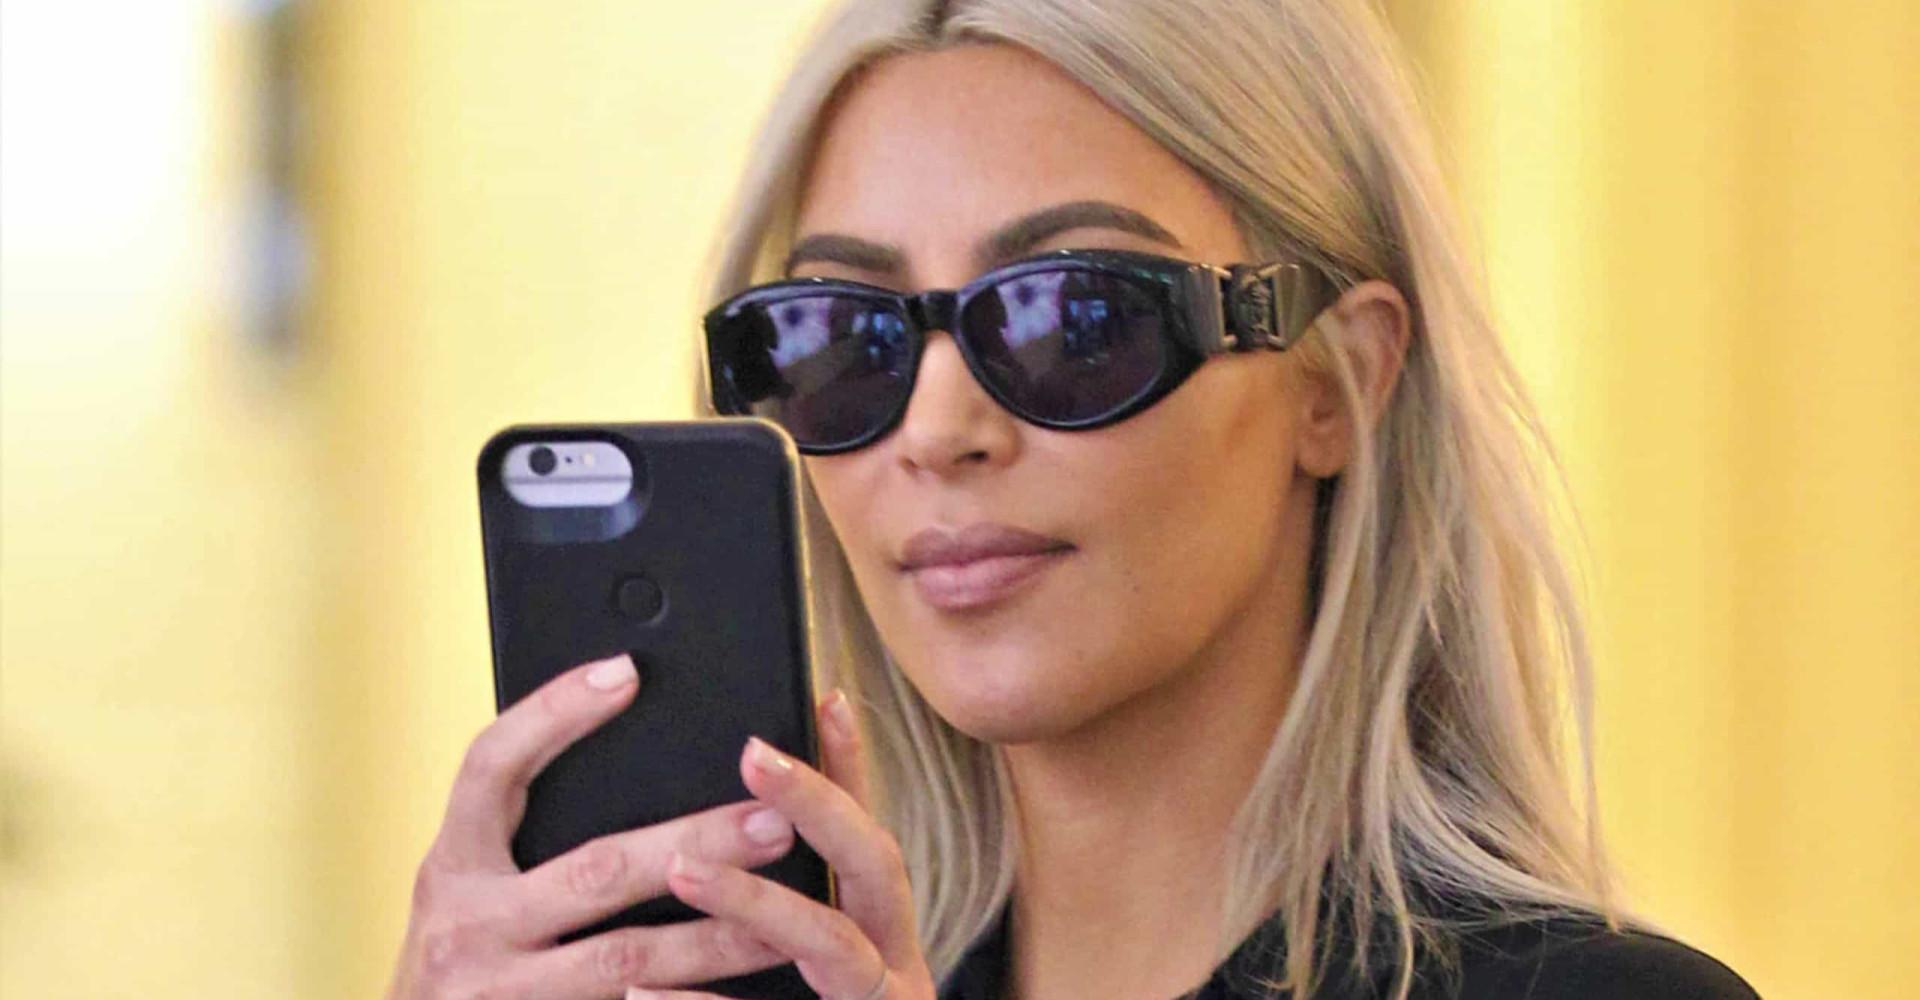 Major celebs with secret social media accounts